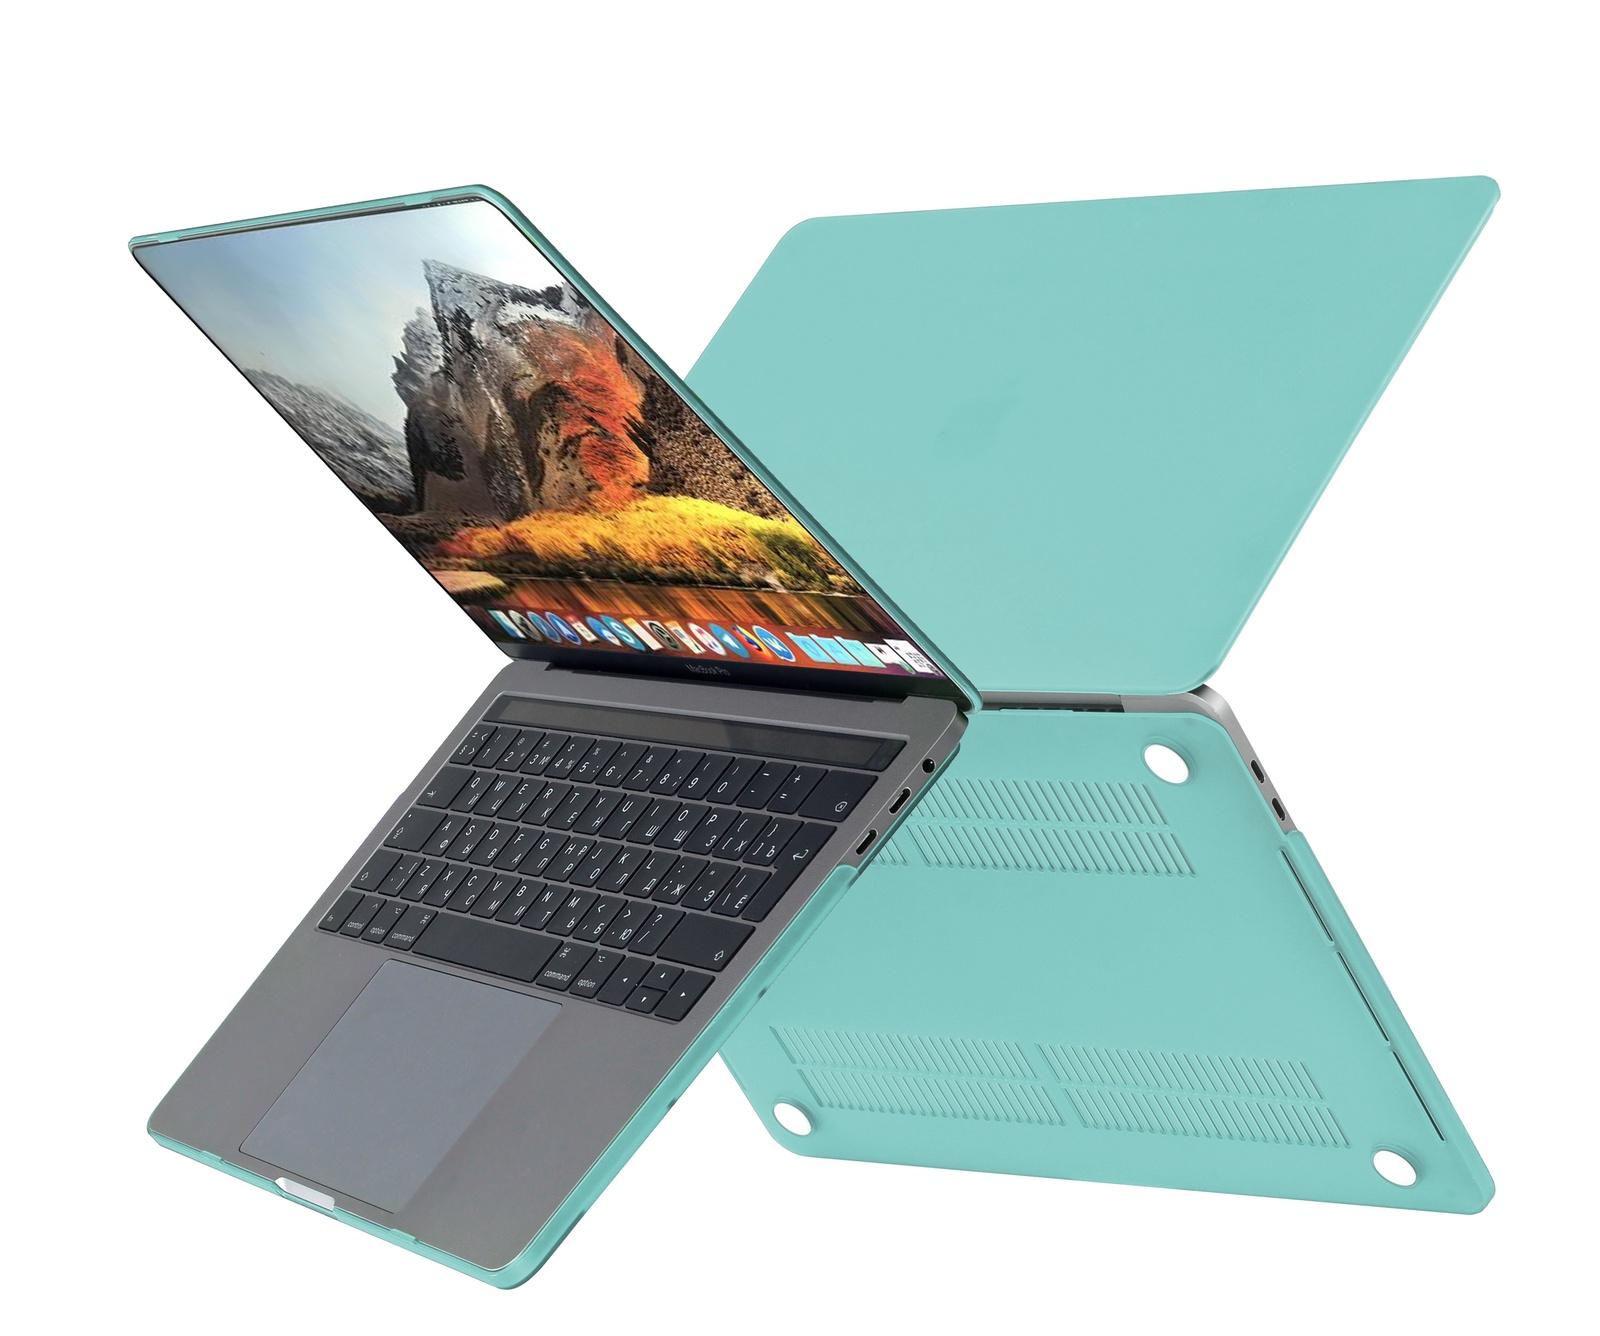 Чехол HardShell Case для Macbook Pro 13 Retina, бирюзовый